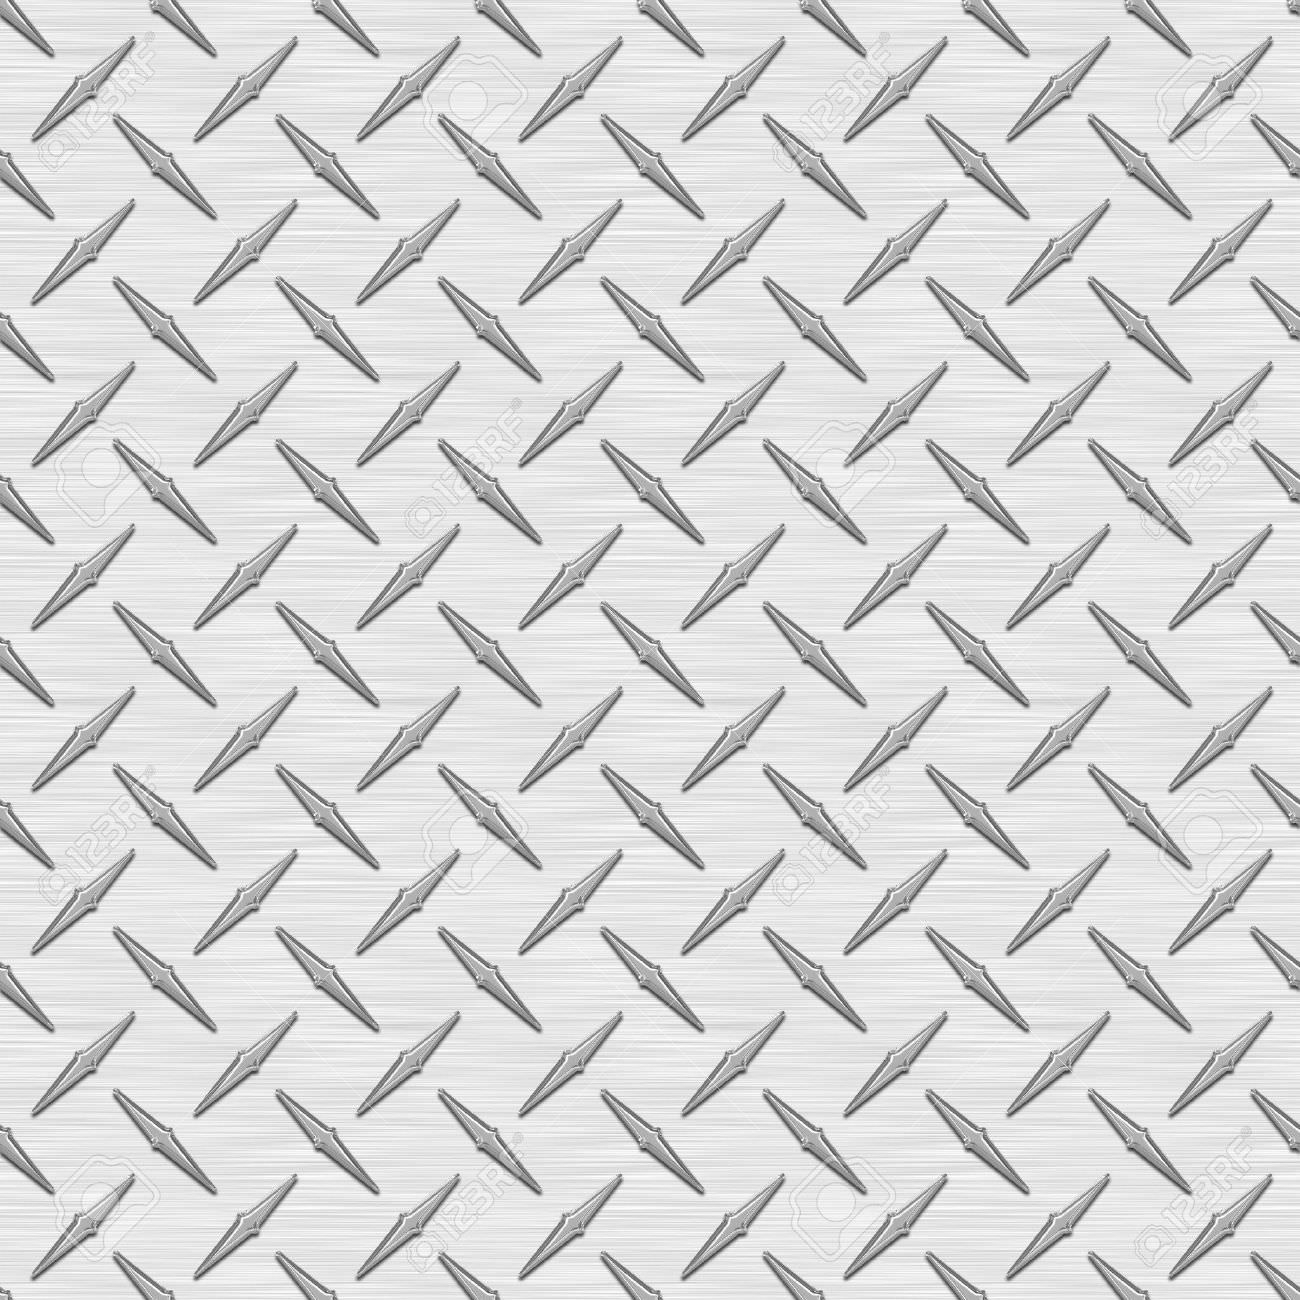 Silver Diamond Plate Texture